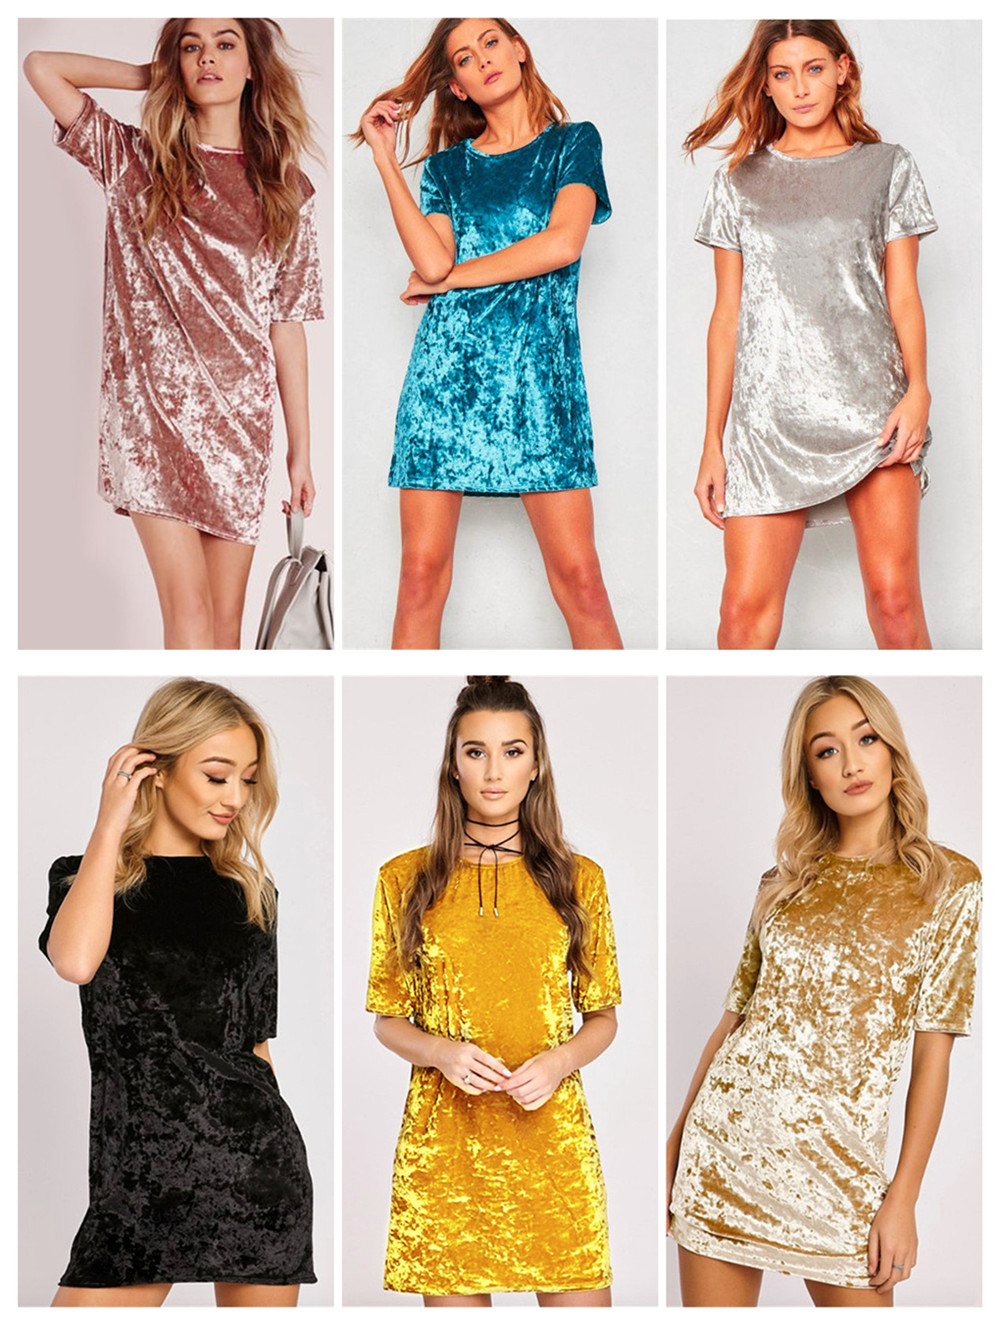 Swaggy HTB1HhfslgfH8KJjy1zcq6ATzpXaR Einfarbiges Mini Sommerkleid in vielen Farben